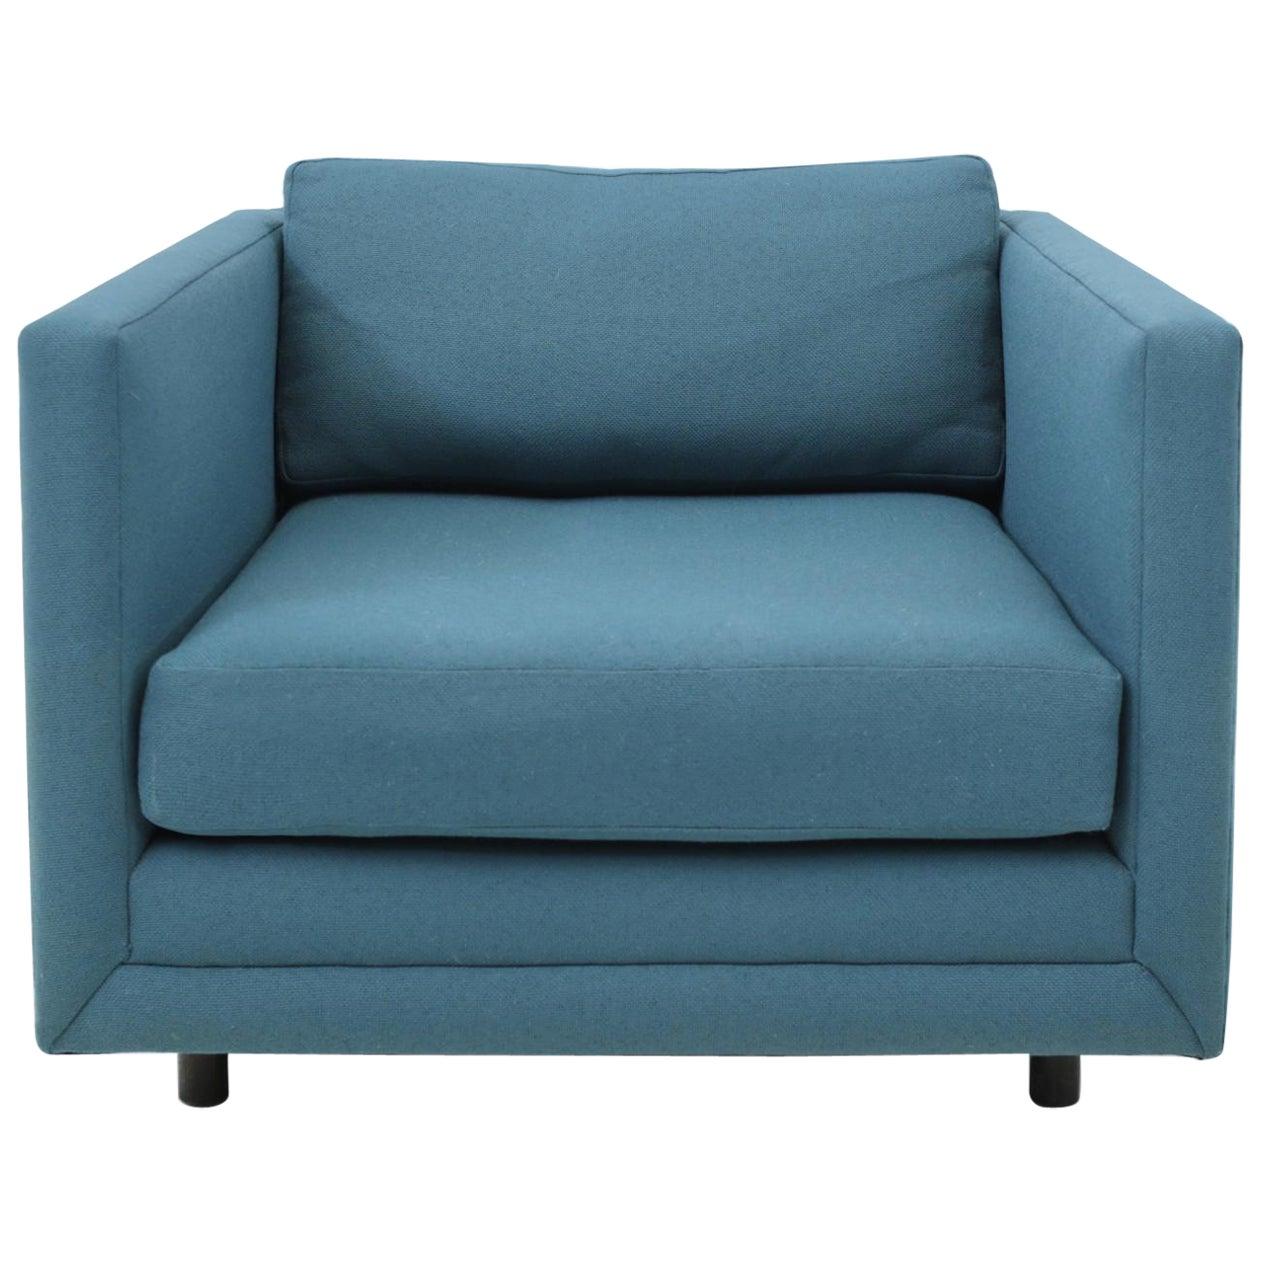 Harvey Probber Tuxedo Lounge Chair